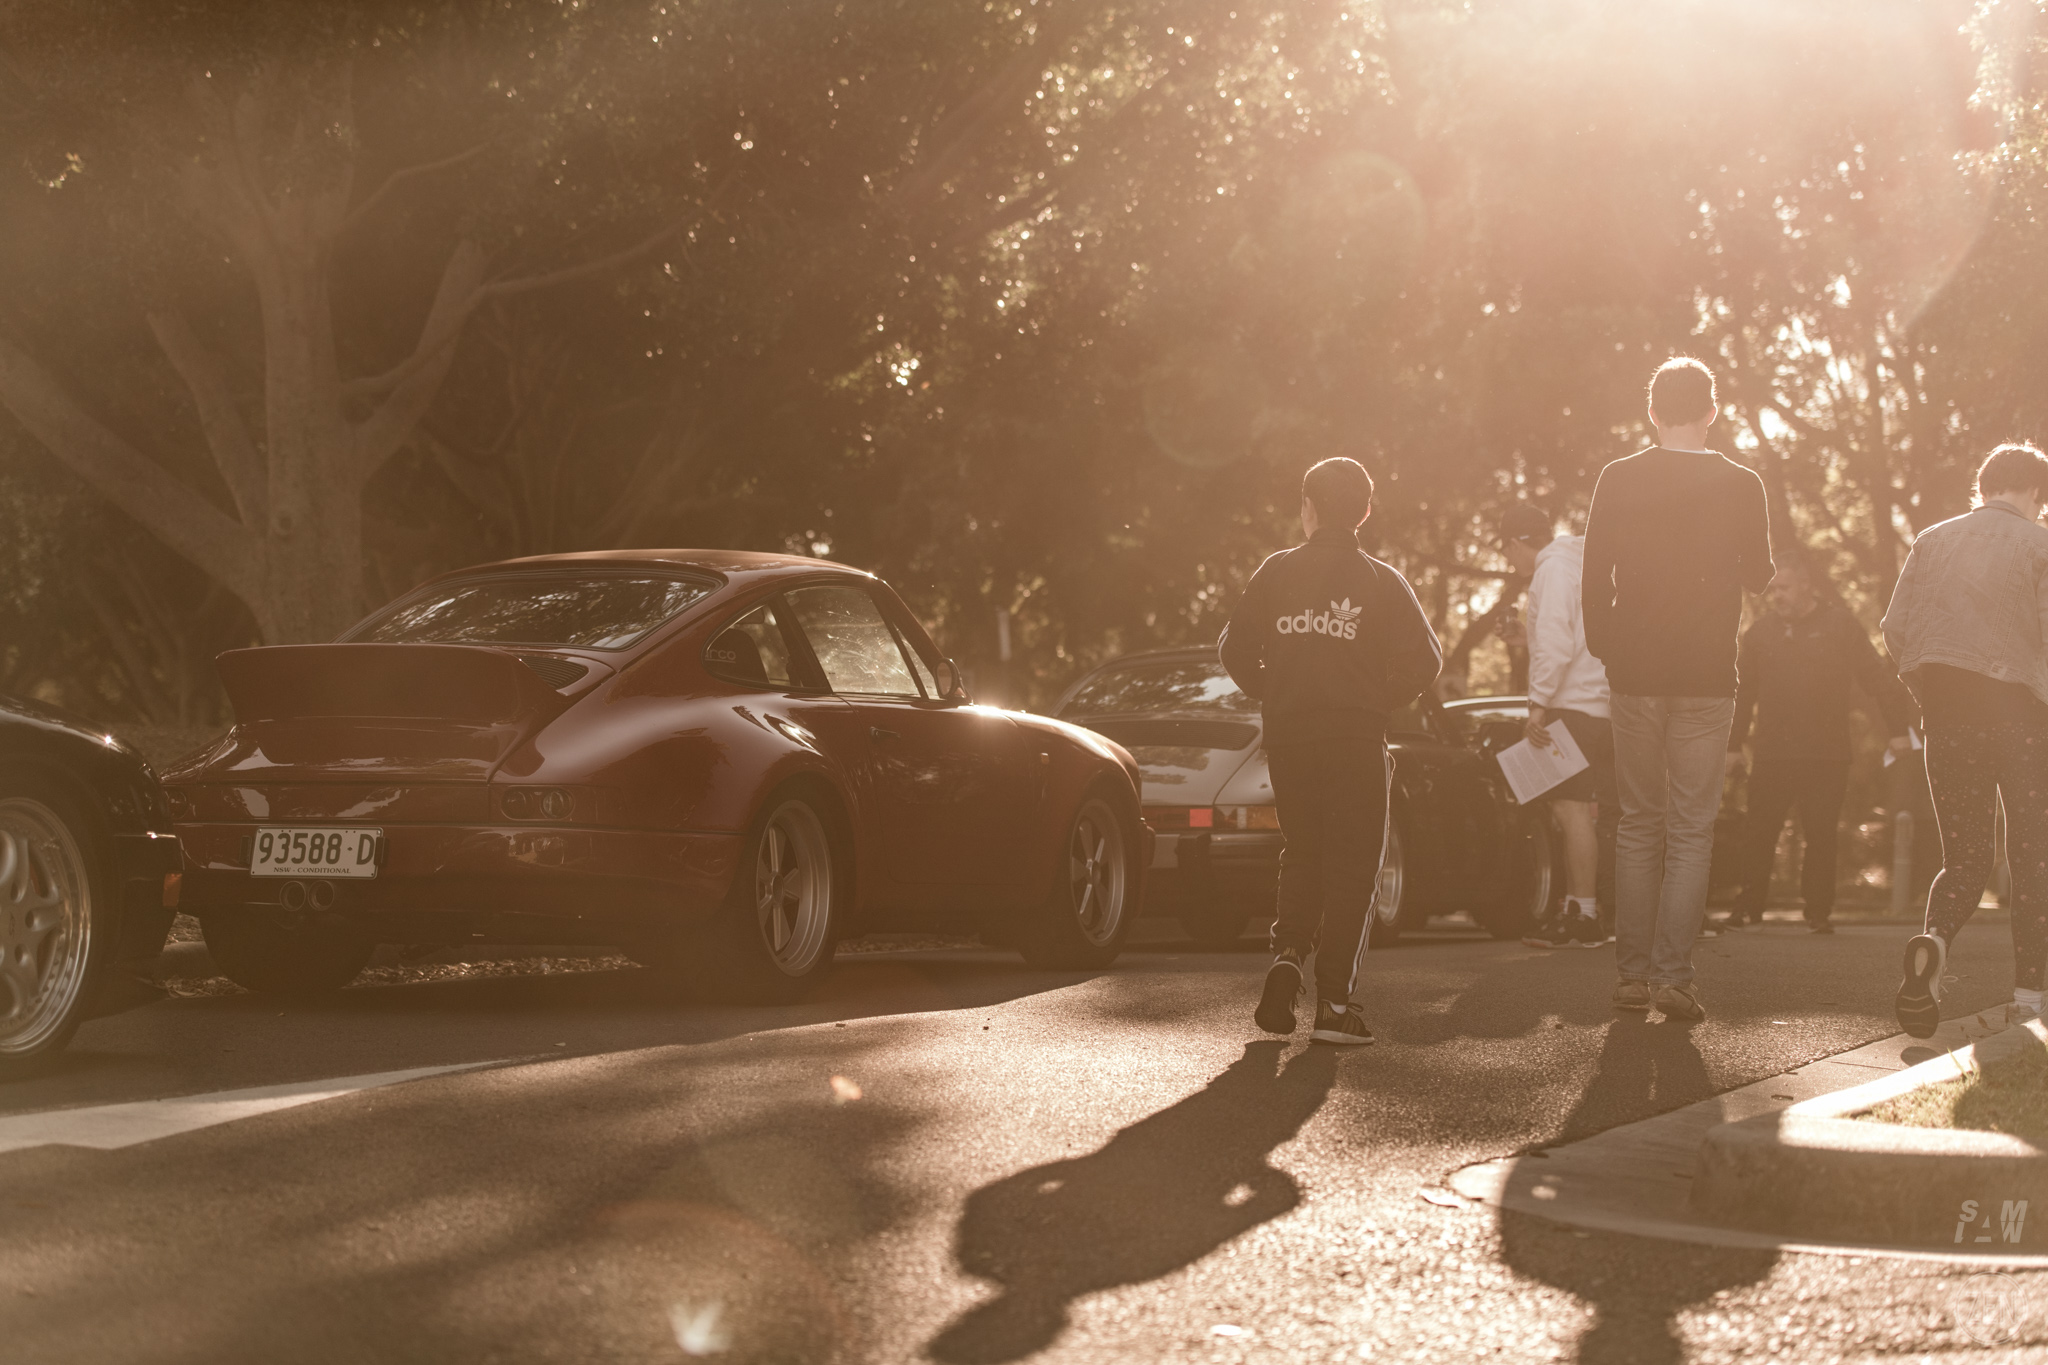 2019-10-27 - Autohaus Porsches & Coffee 081